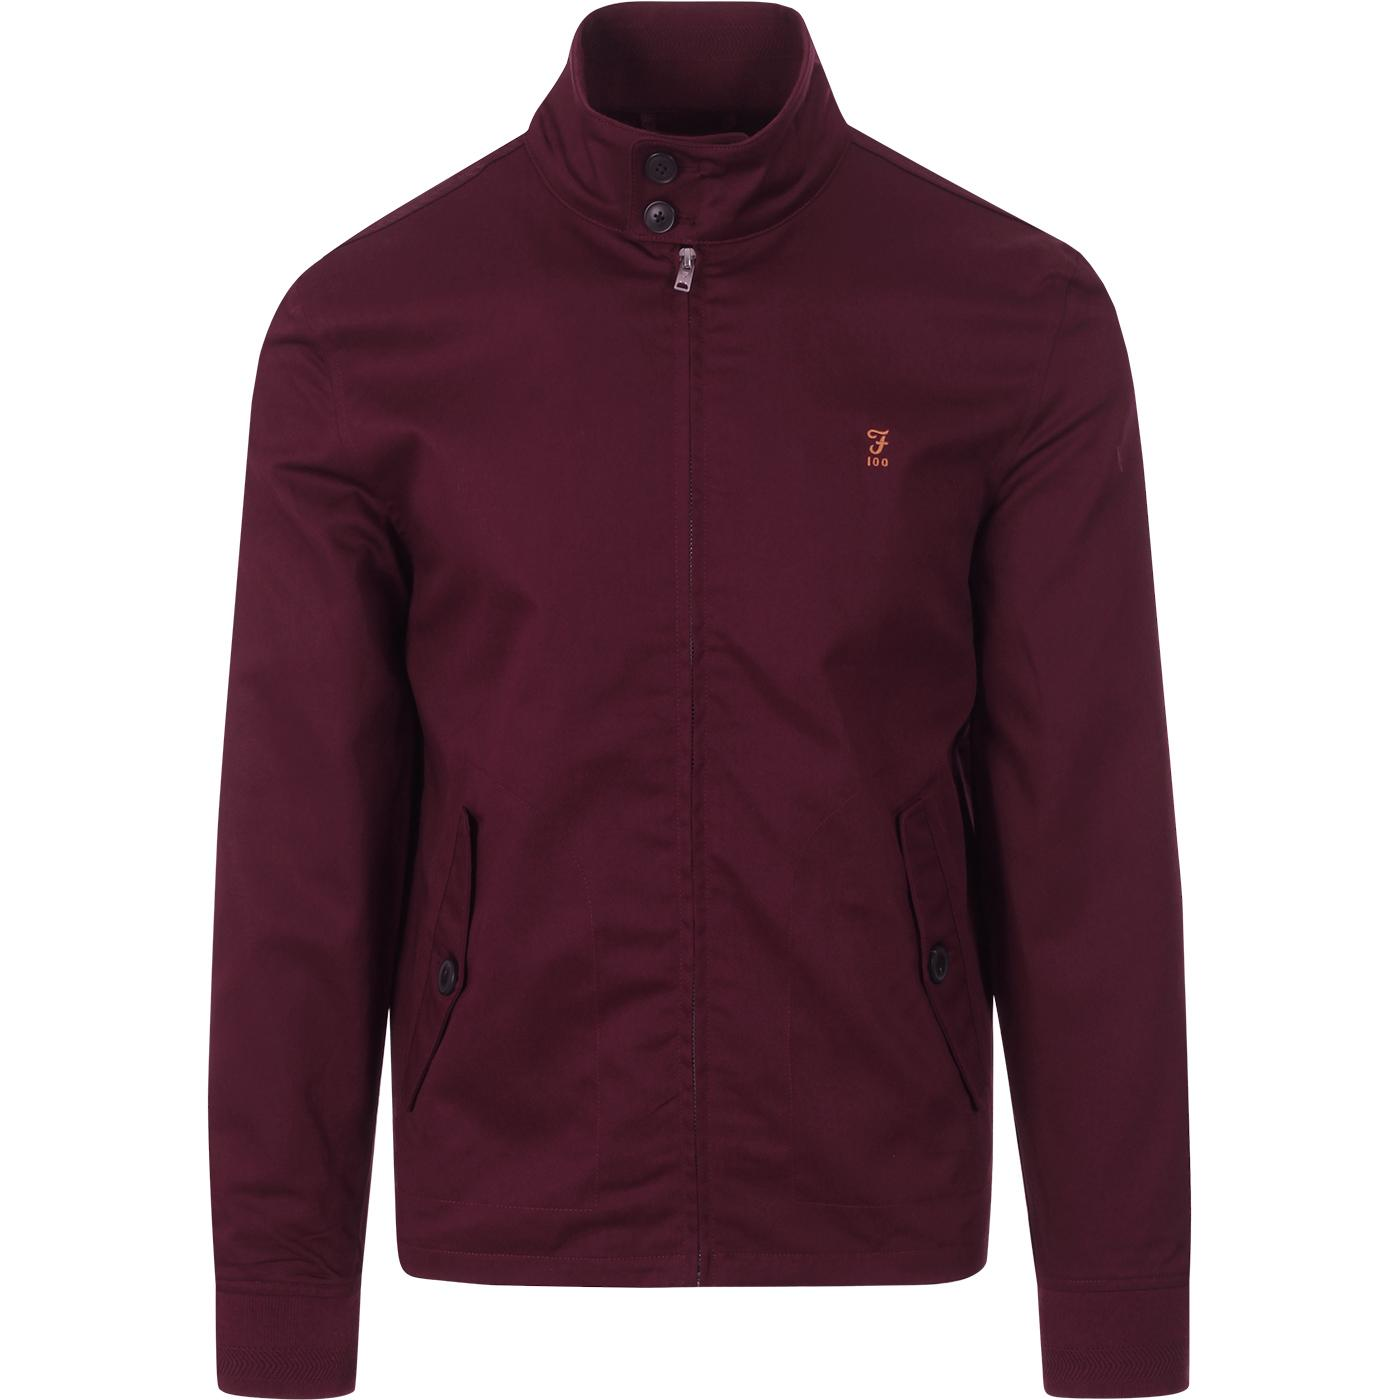 Hardy FARAH 100 Mod Harrington Jacket (Raspberry)